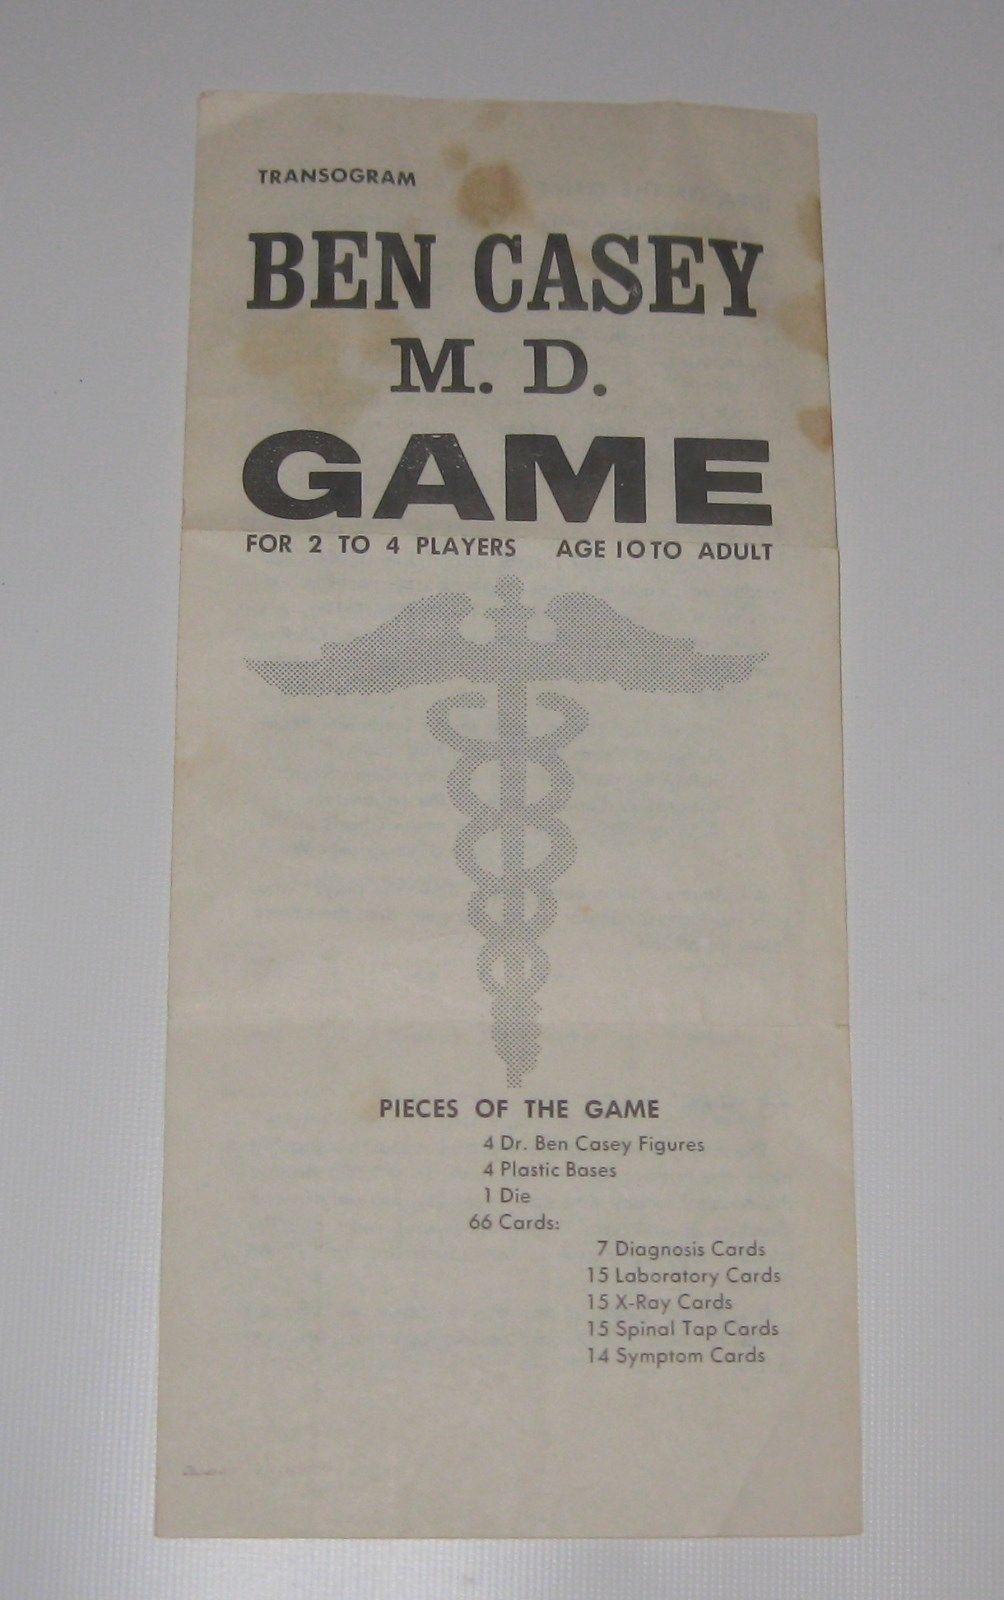 Transogram 3828-198 -- 1961 Ben Casey M.D. - Drama of Life in Big Metro Hospital image 6